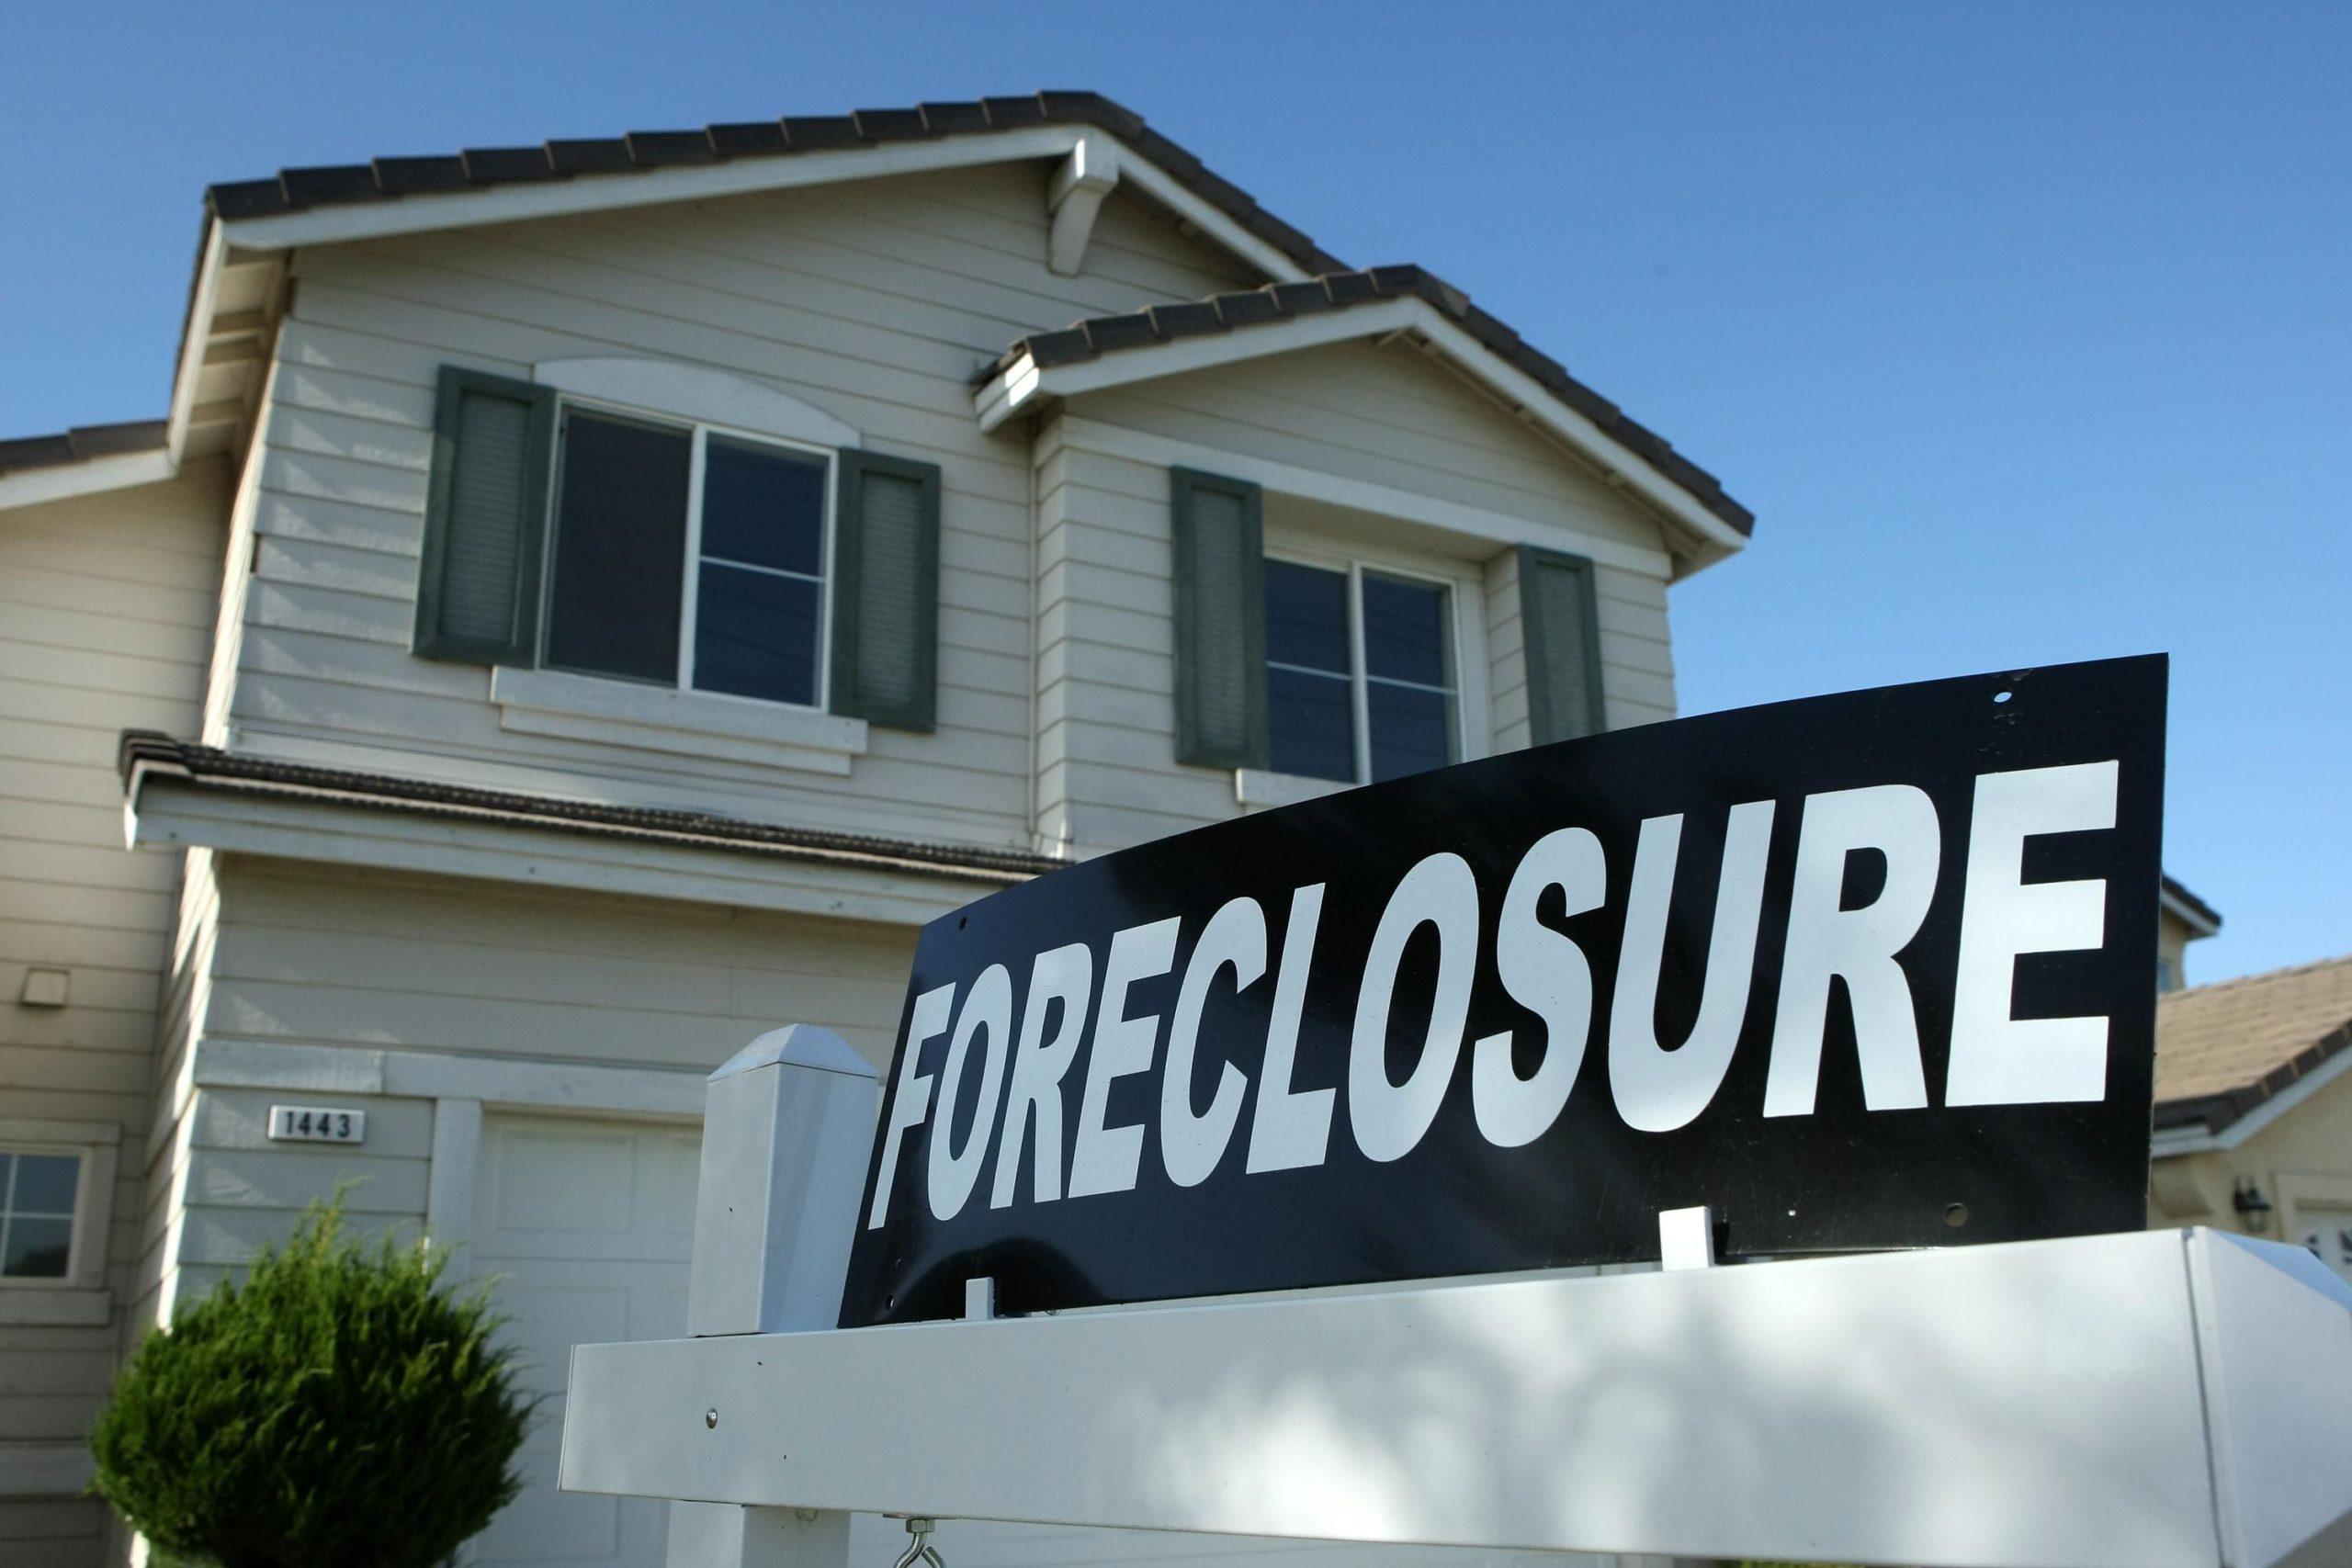 Facing Foreclosure